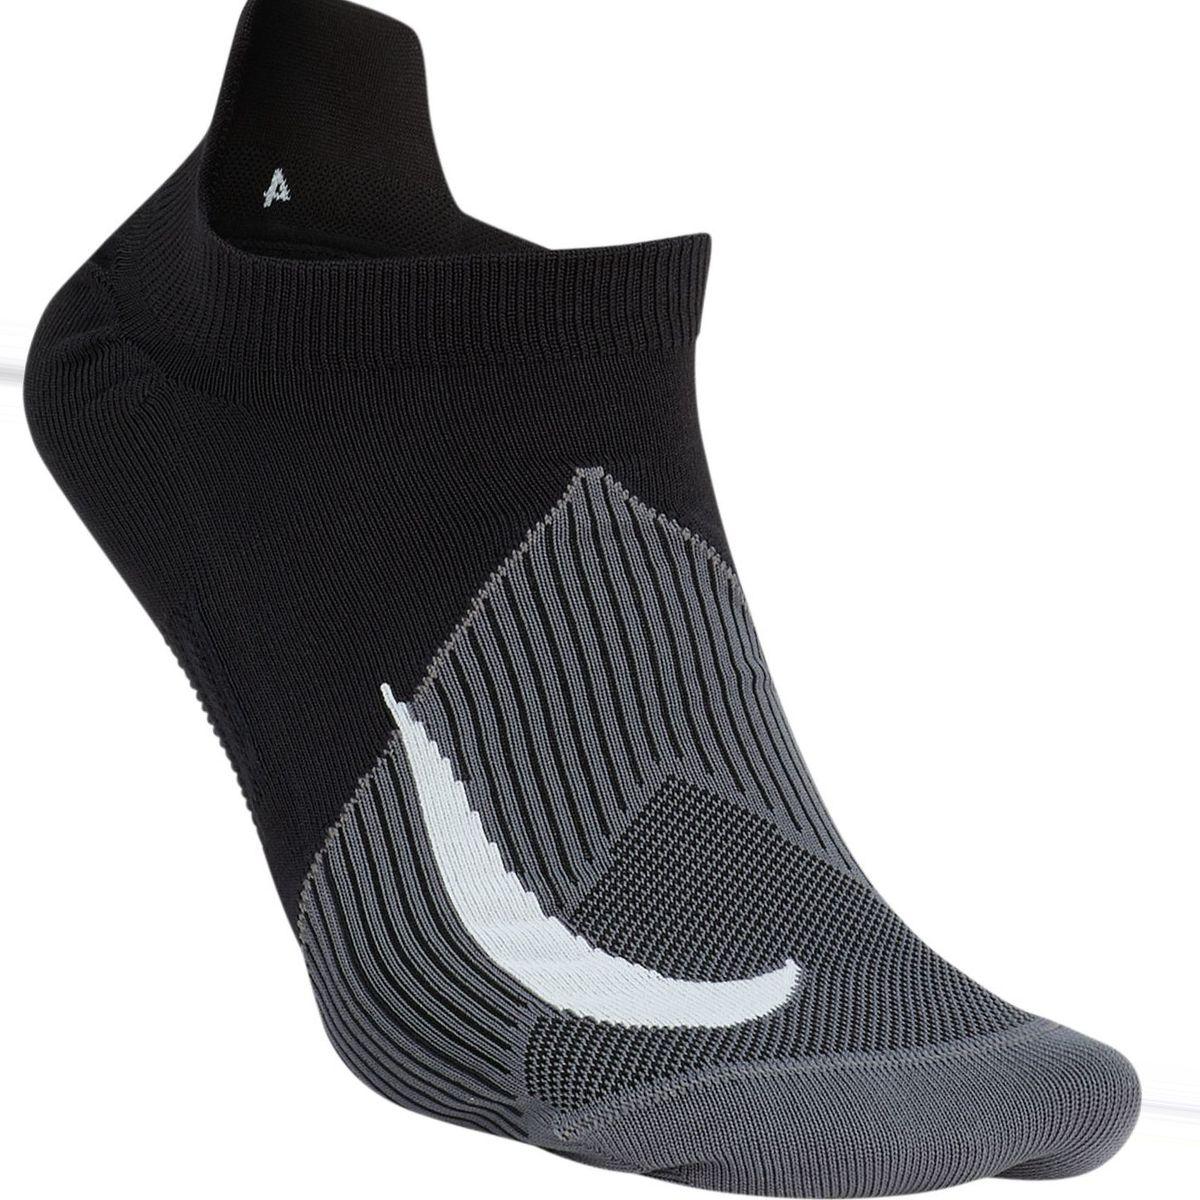 Nike Elite Running Lightweight No-Show Sock - Men's